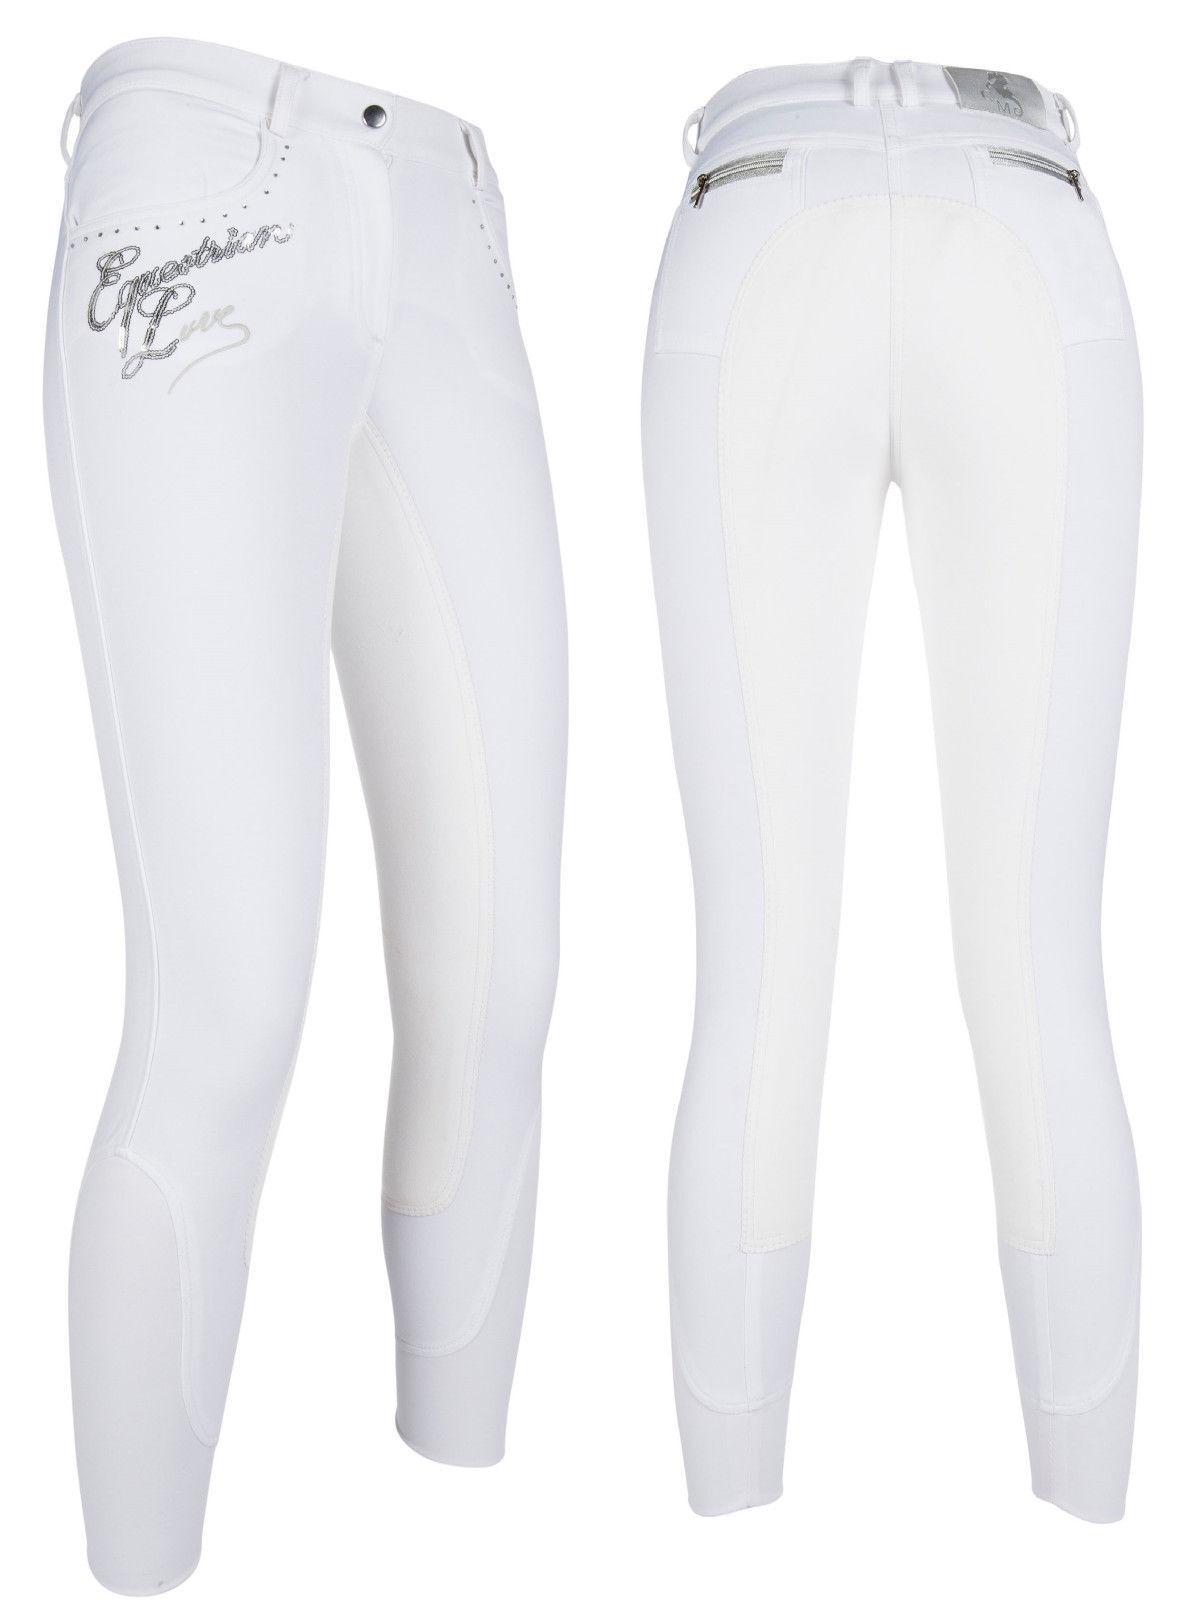 HKM TournaHommest Riding Pants RIMINI Crystal Cavallino Marino Full Trim blanc